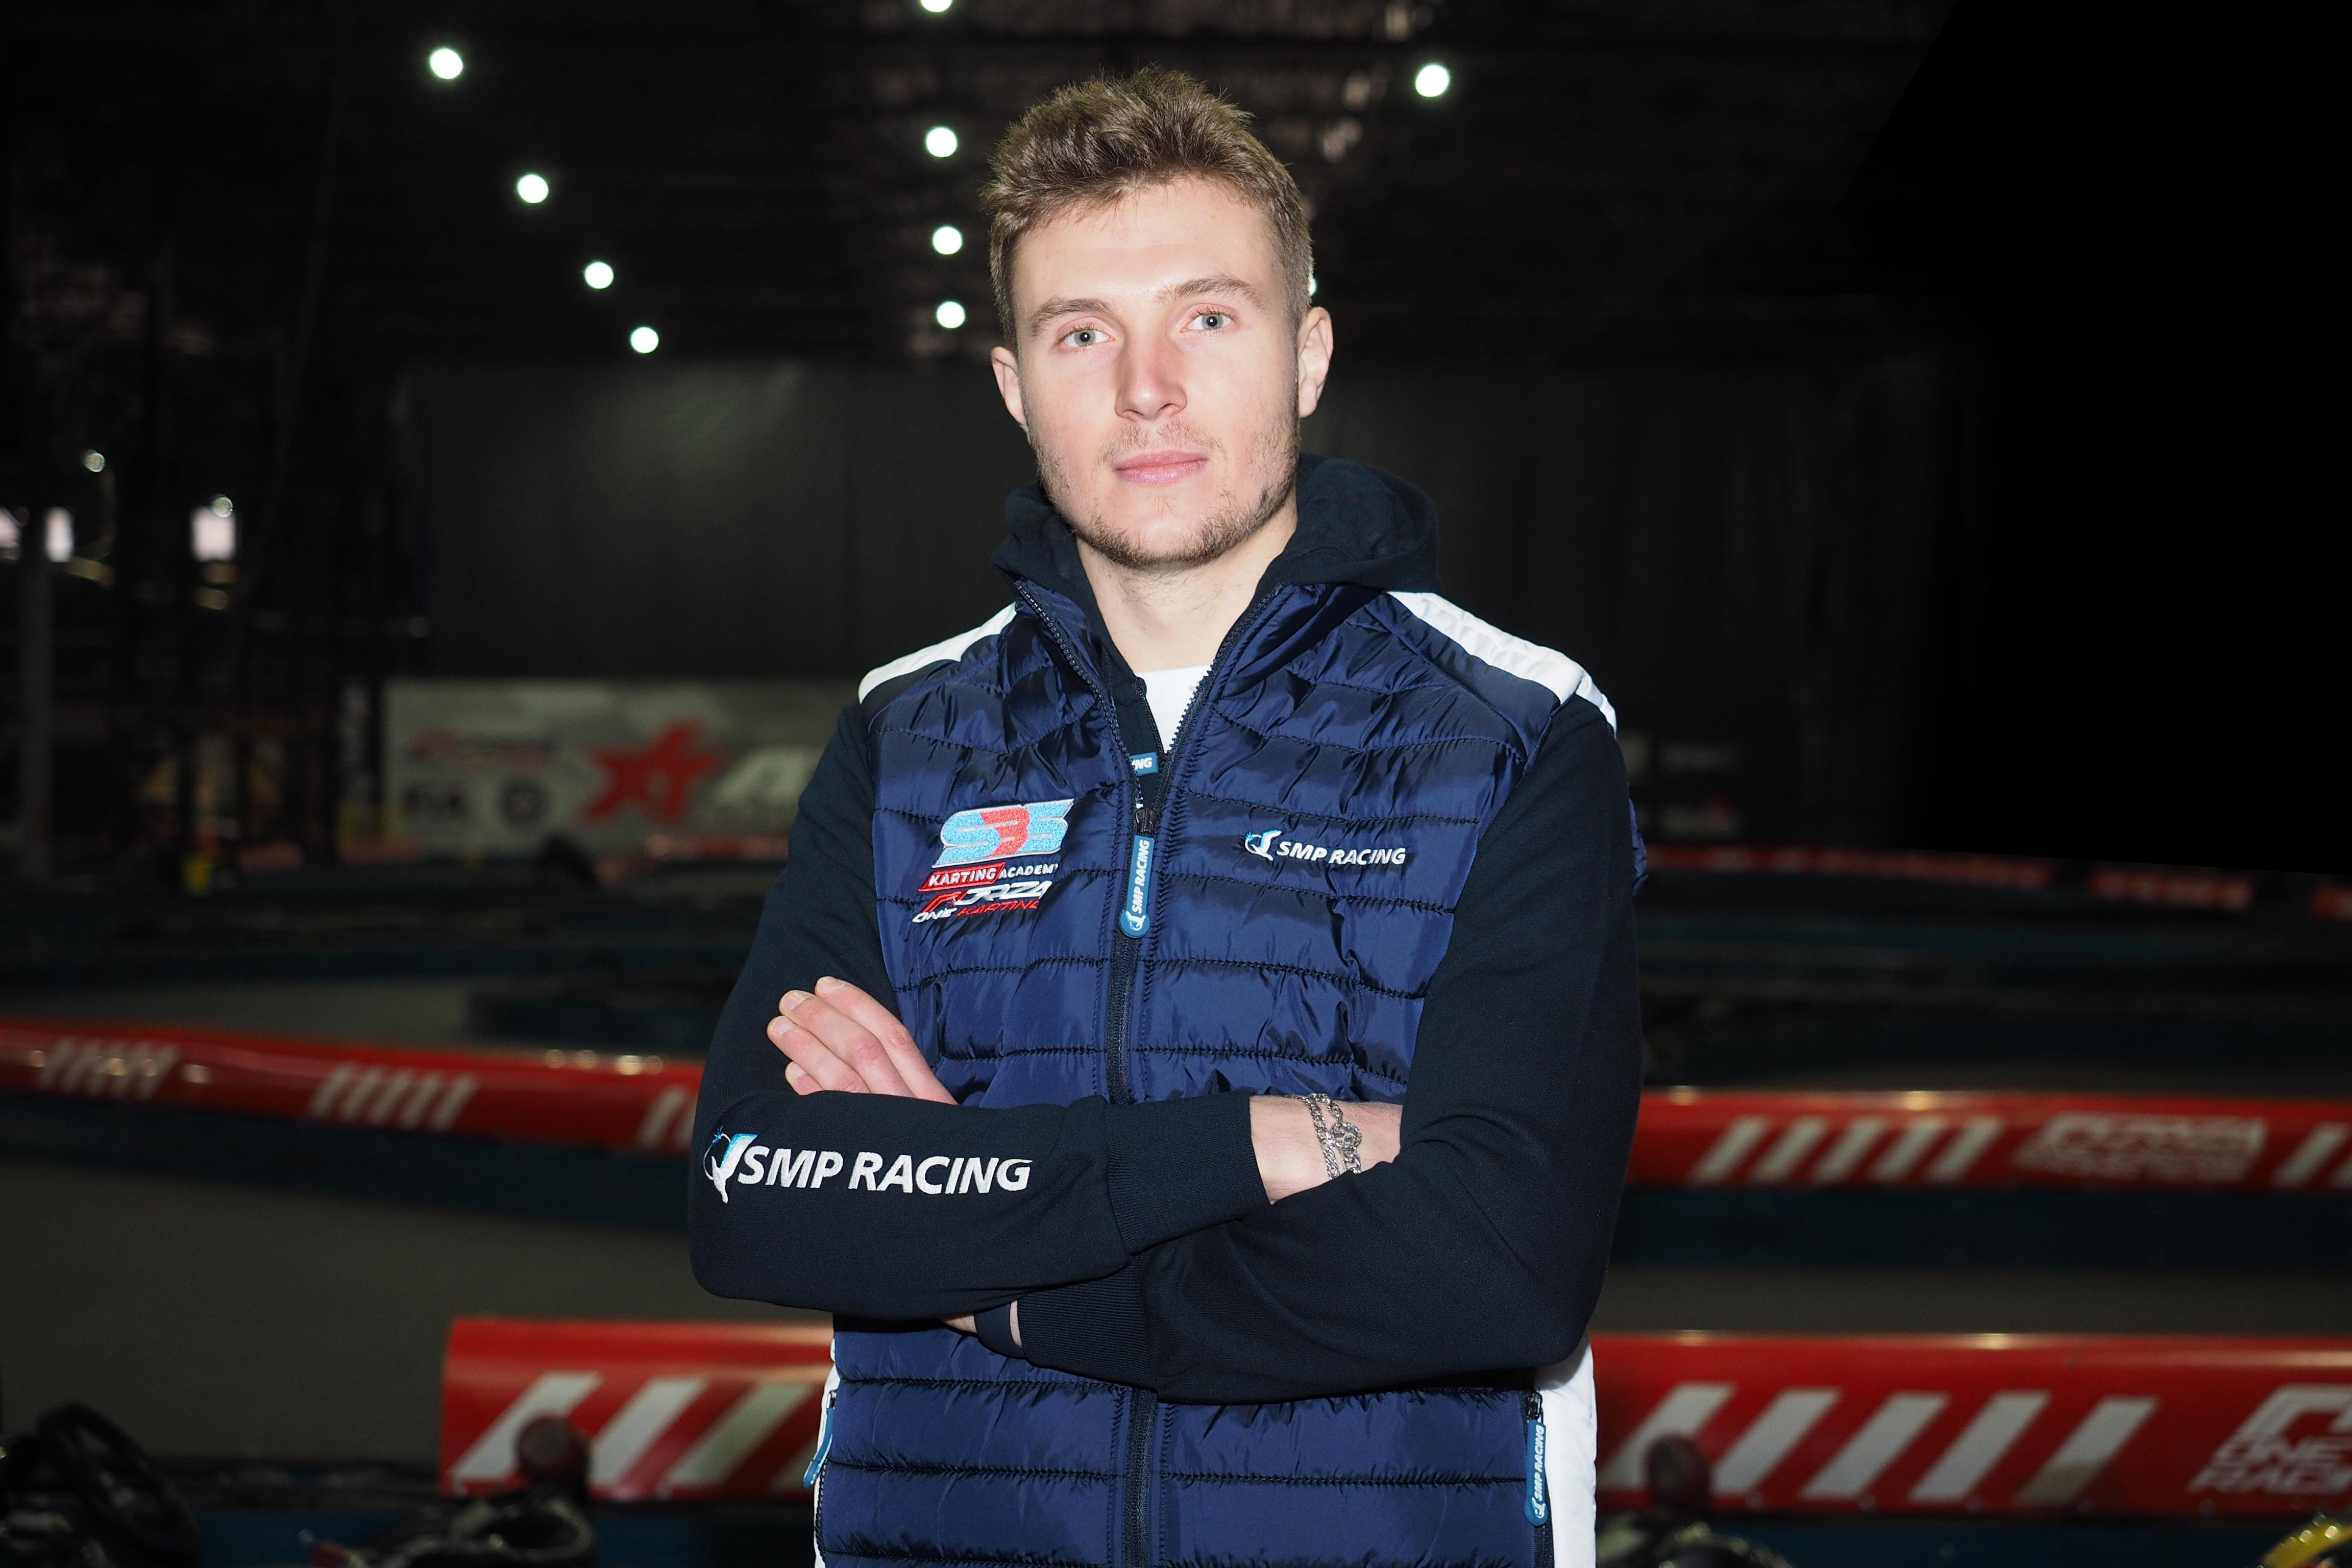 F1 Formula 1 Sergey Sirotkin SMP Racing karting academy Russia